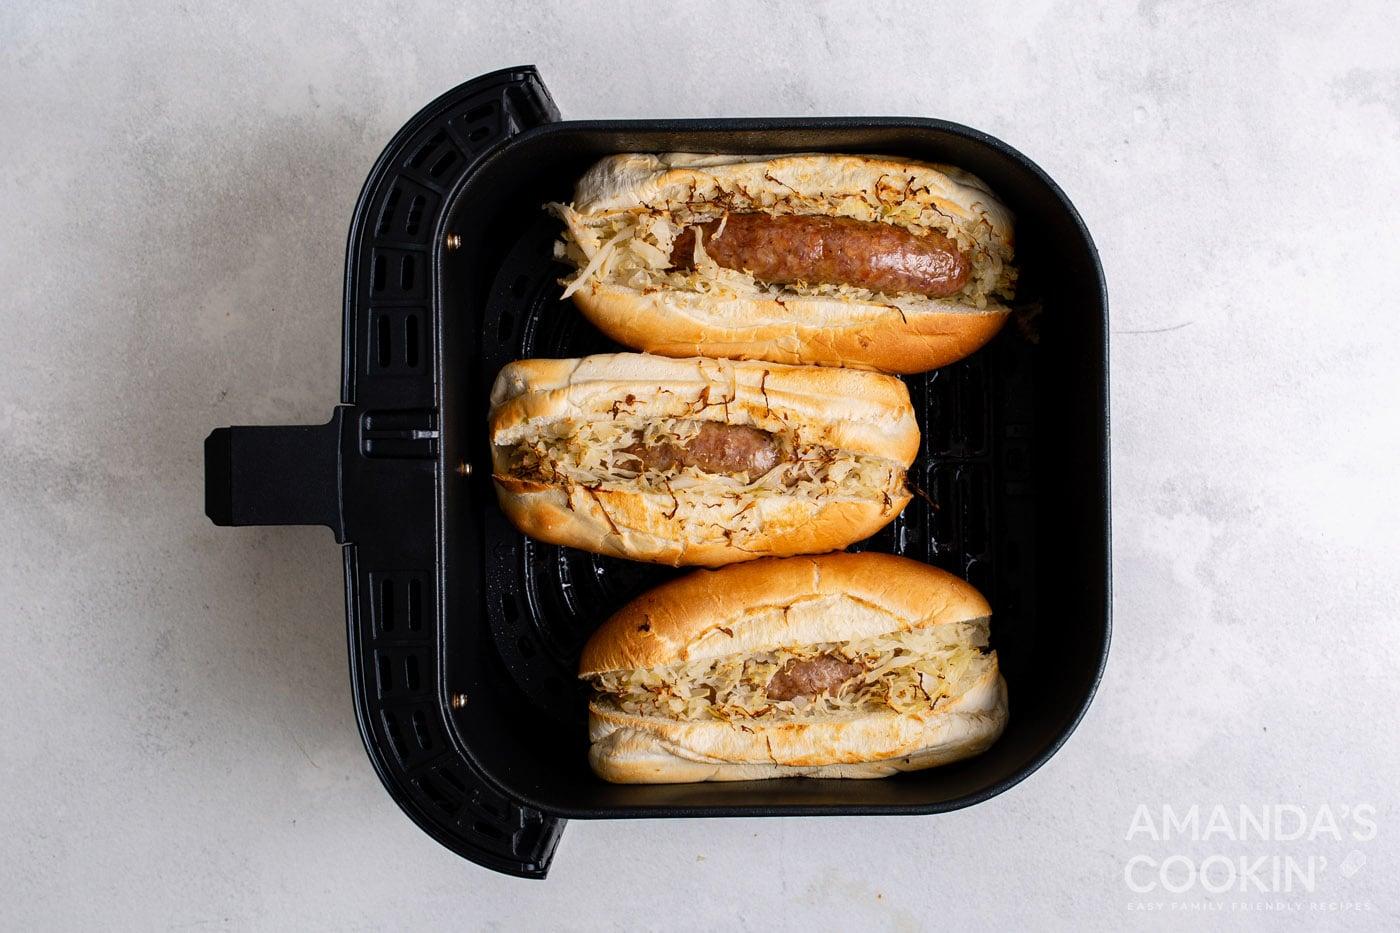 Cooked bratwurst in a bun